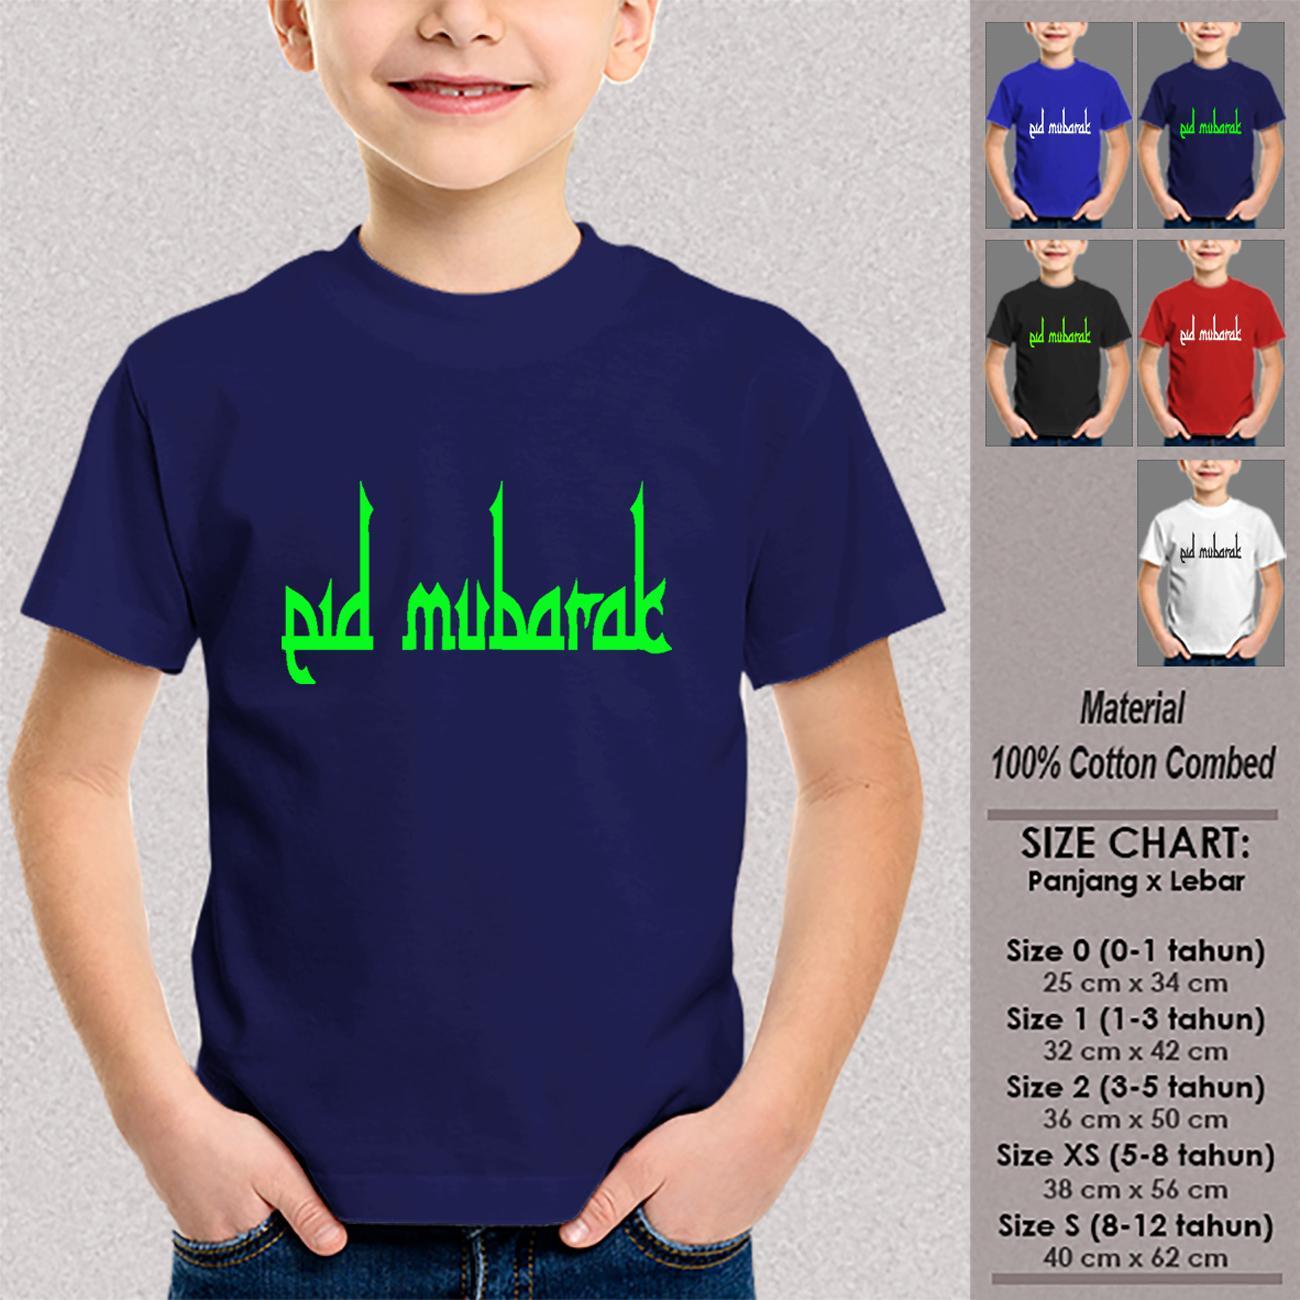 Jual Baju Anak Muslim Miyaz SN-ASMSMY001 EID AL ADHA Kaos Ramadhan Size Anak 1-12 Tahun